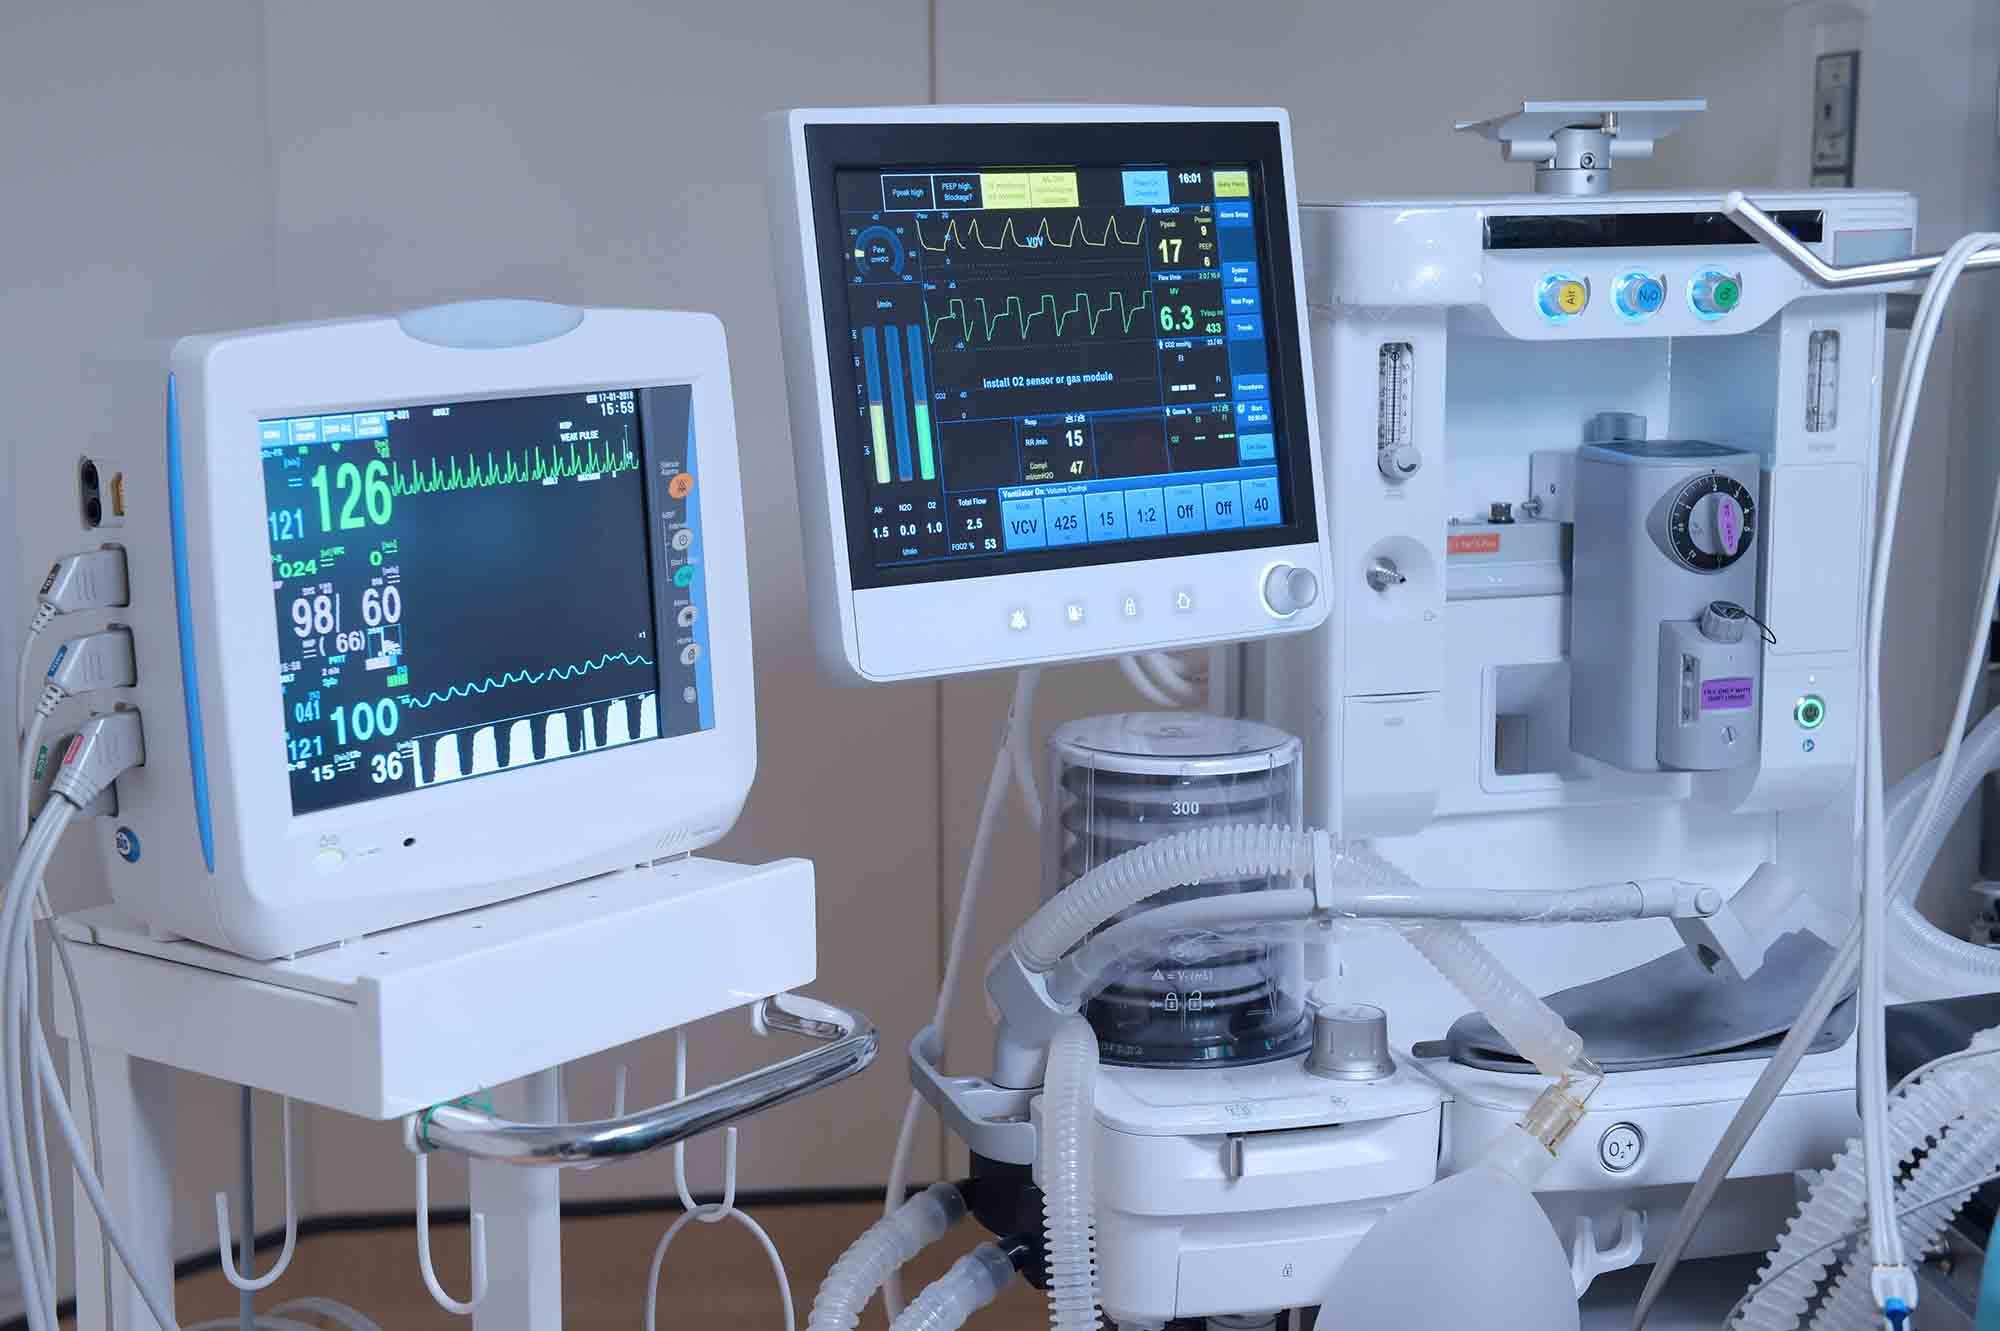 equipamentos medicos hospitalares o que sao